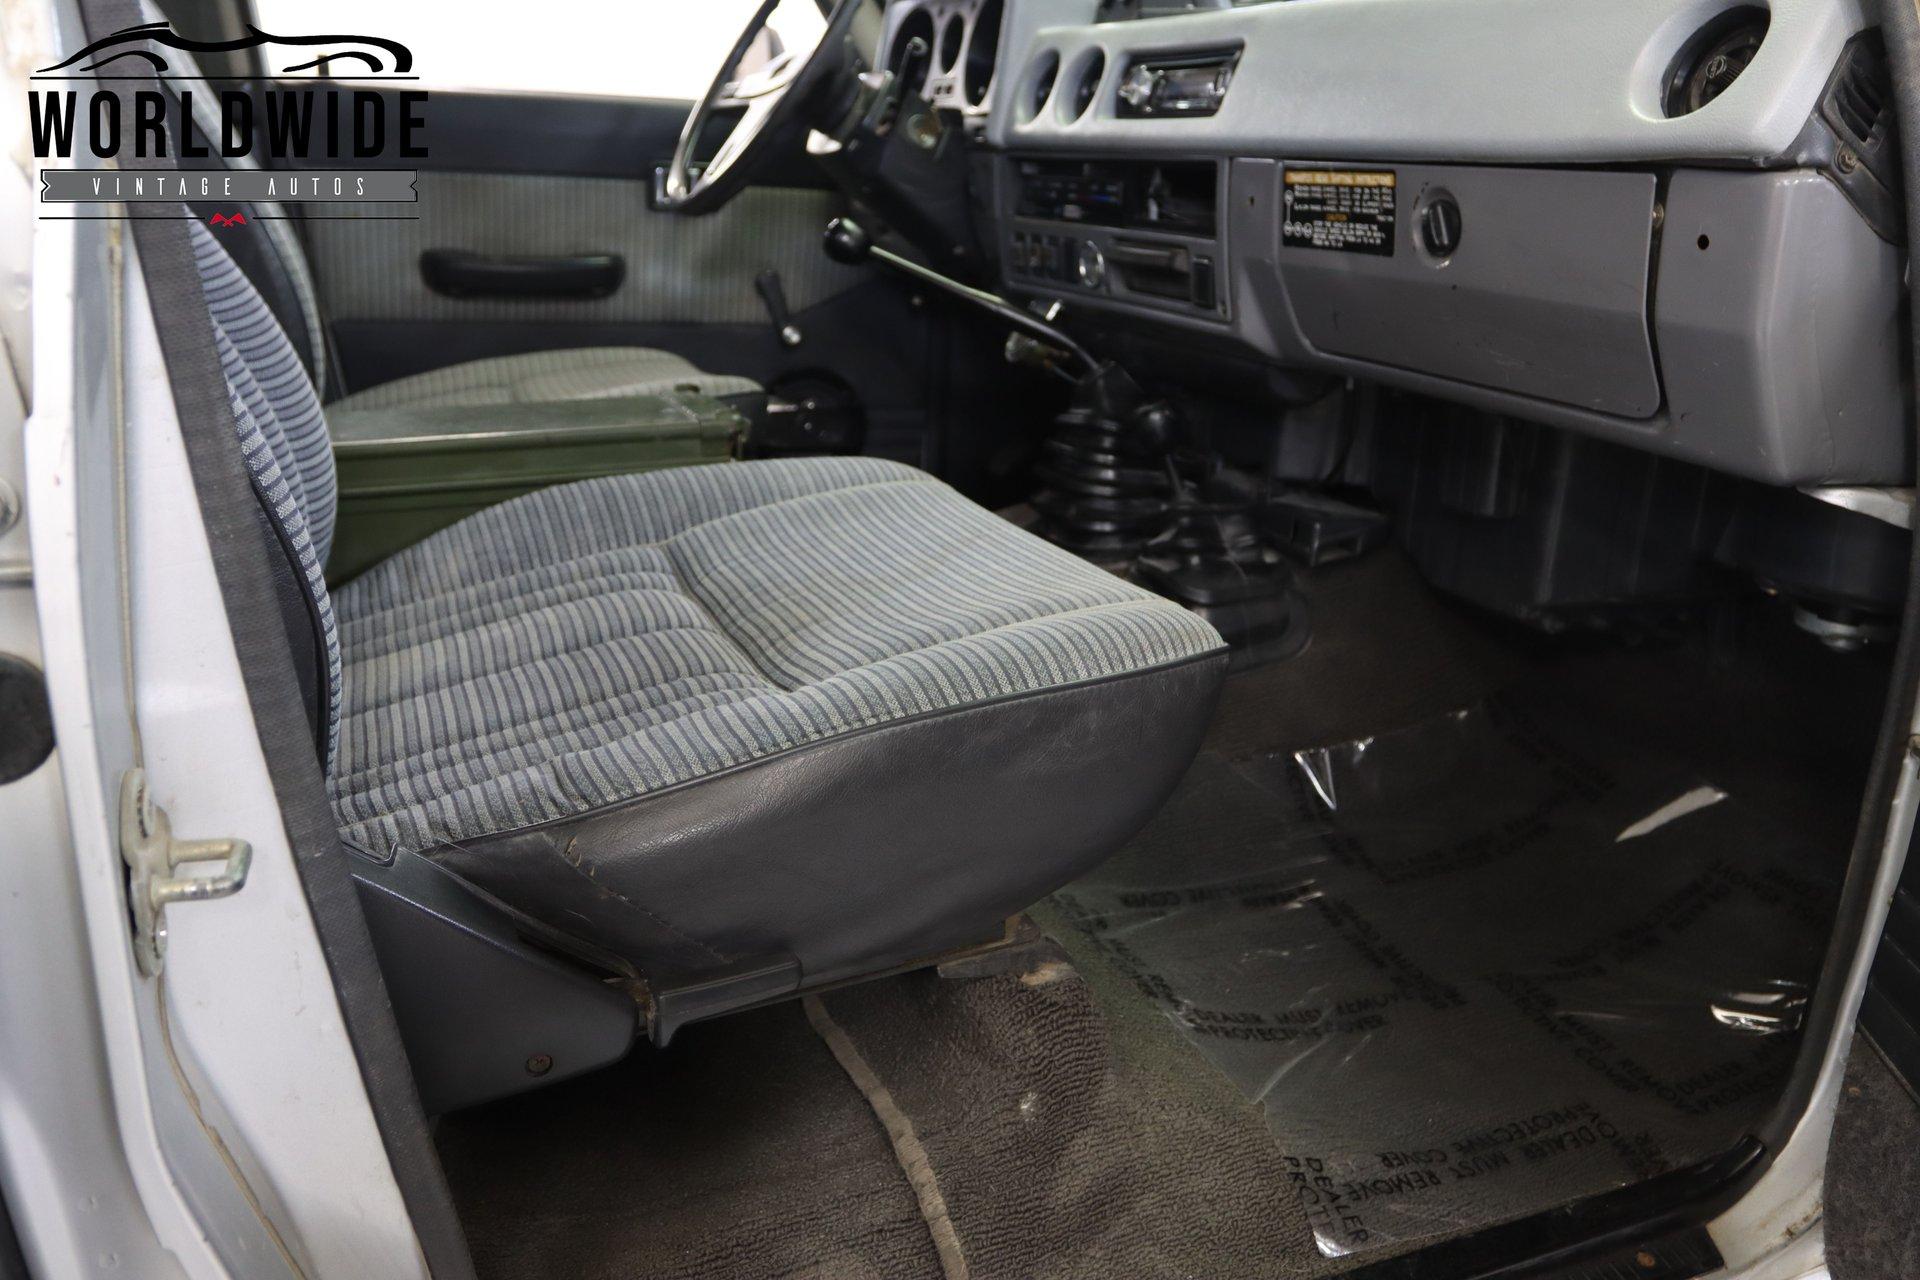 1985 Toyota FJ-60 Land Cruiser